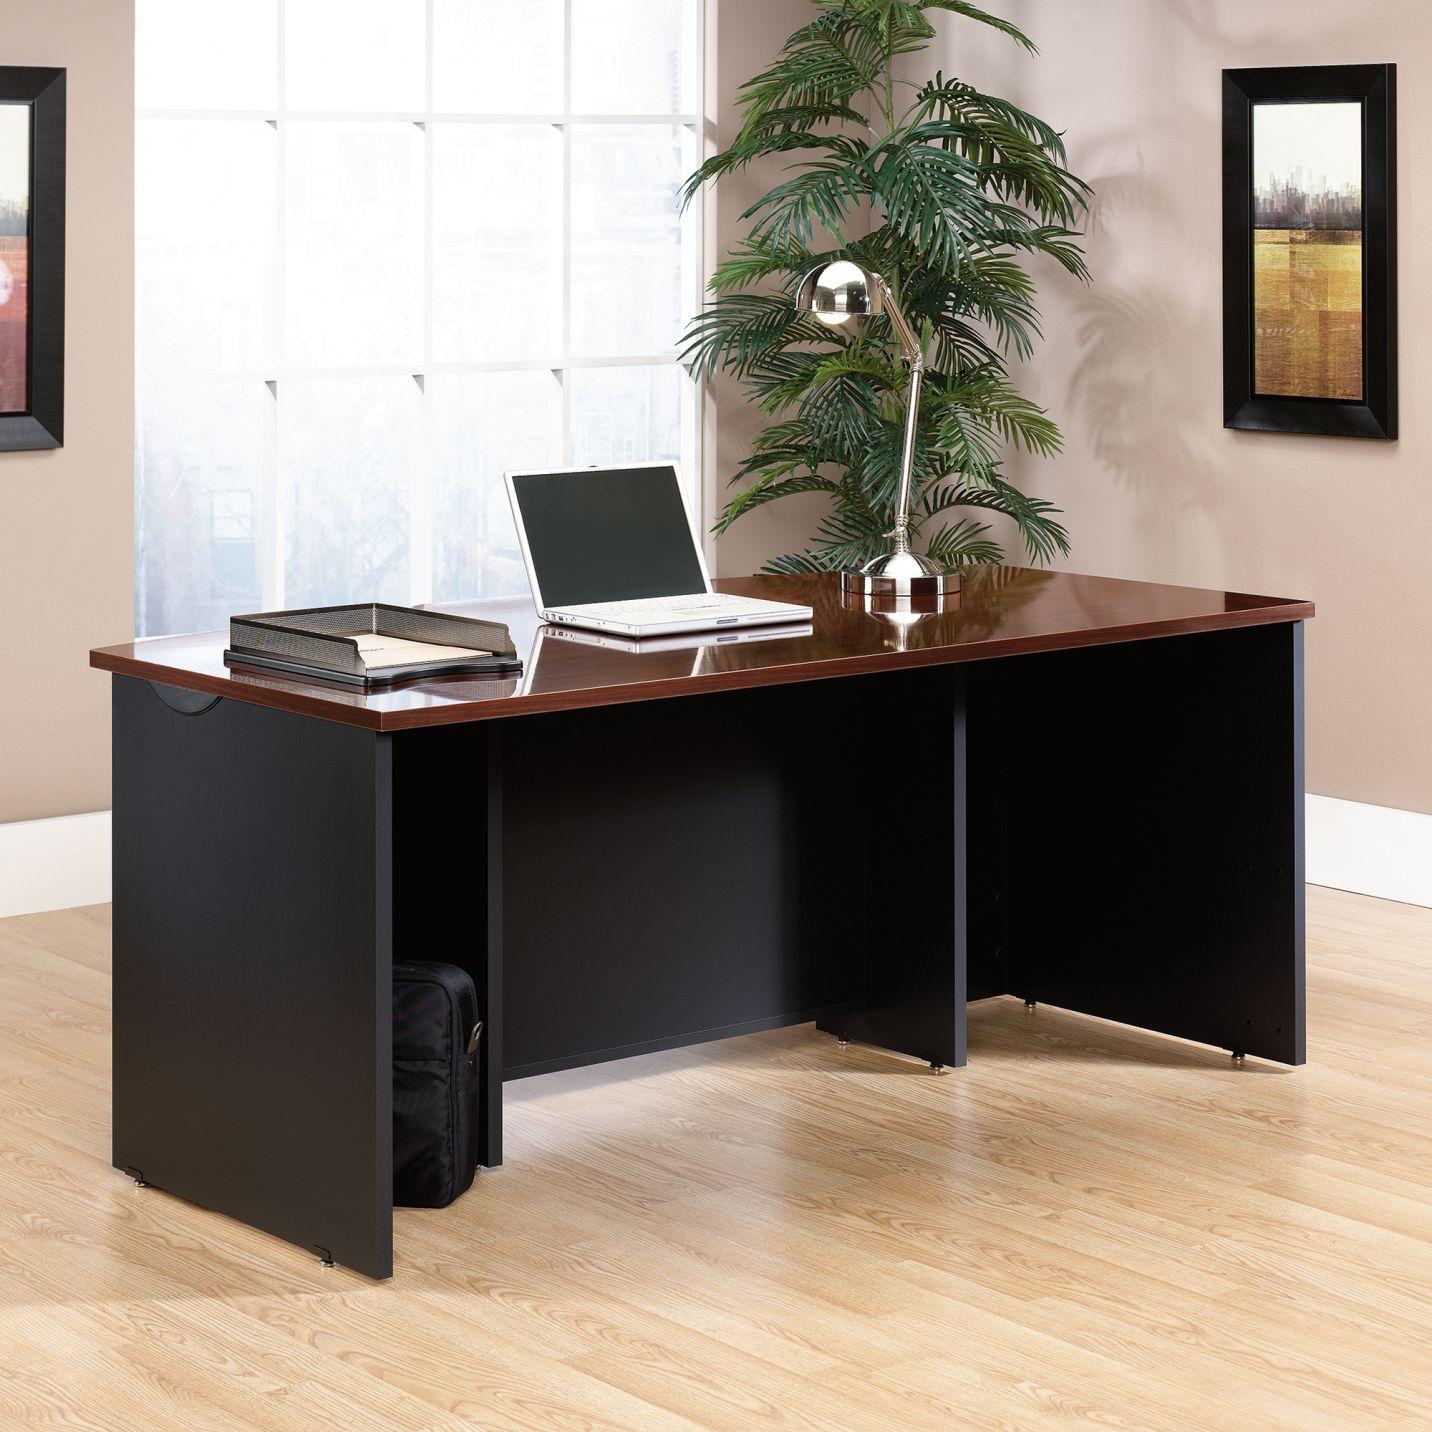 Sauder Via Executive Desk Large Home Office Furniture Check more